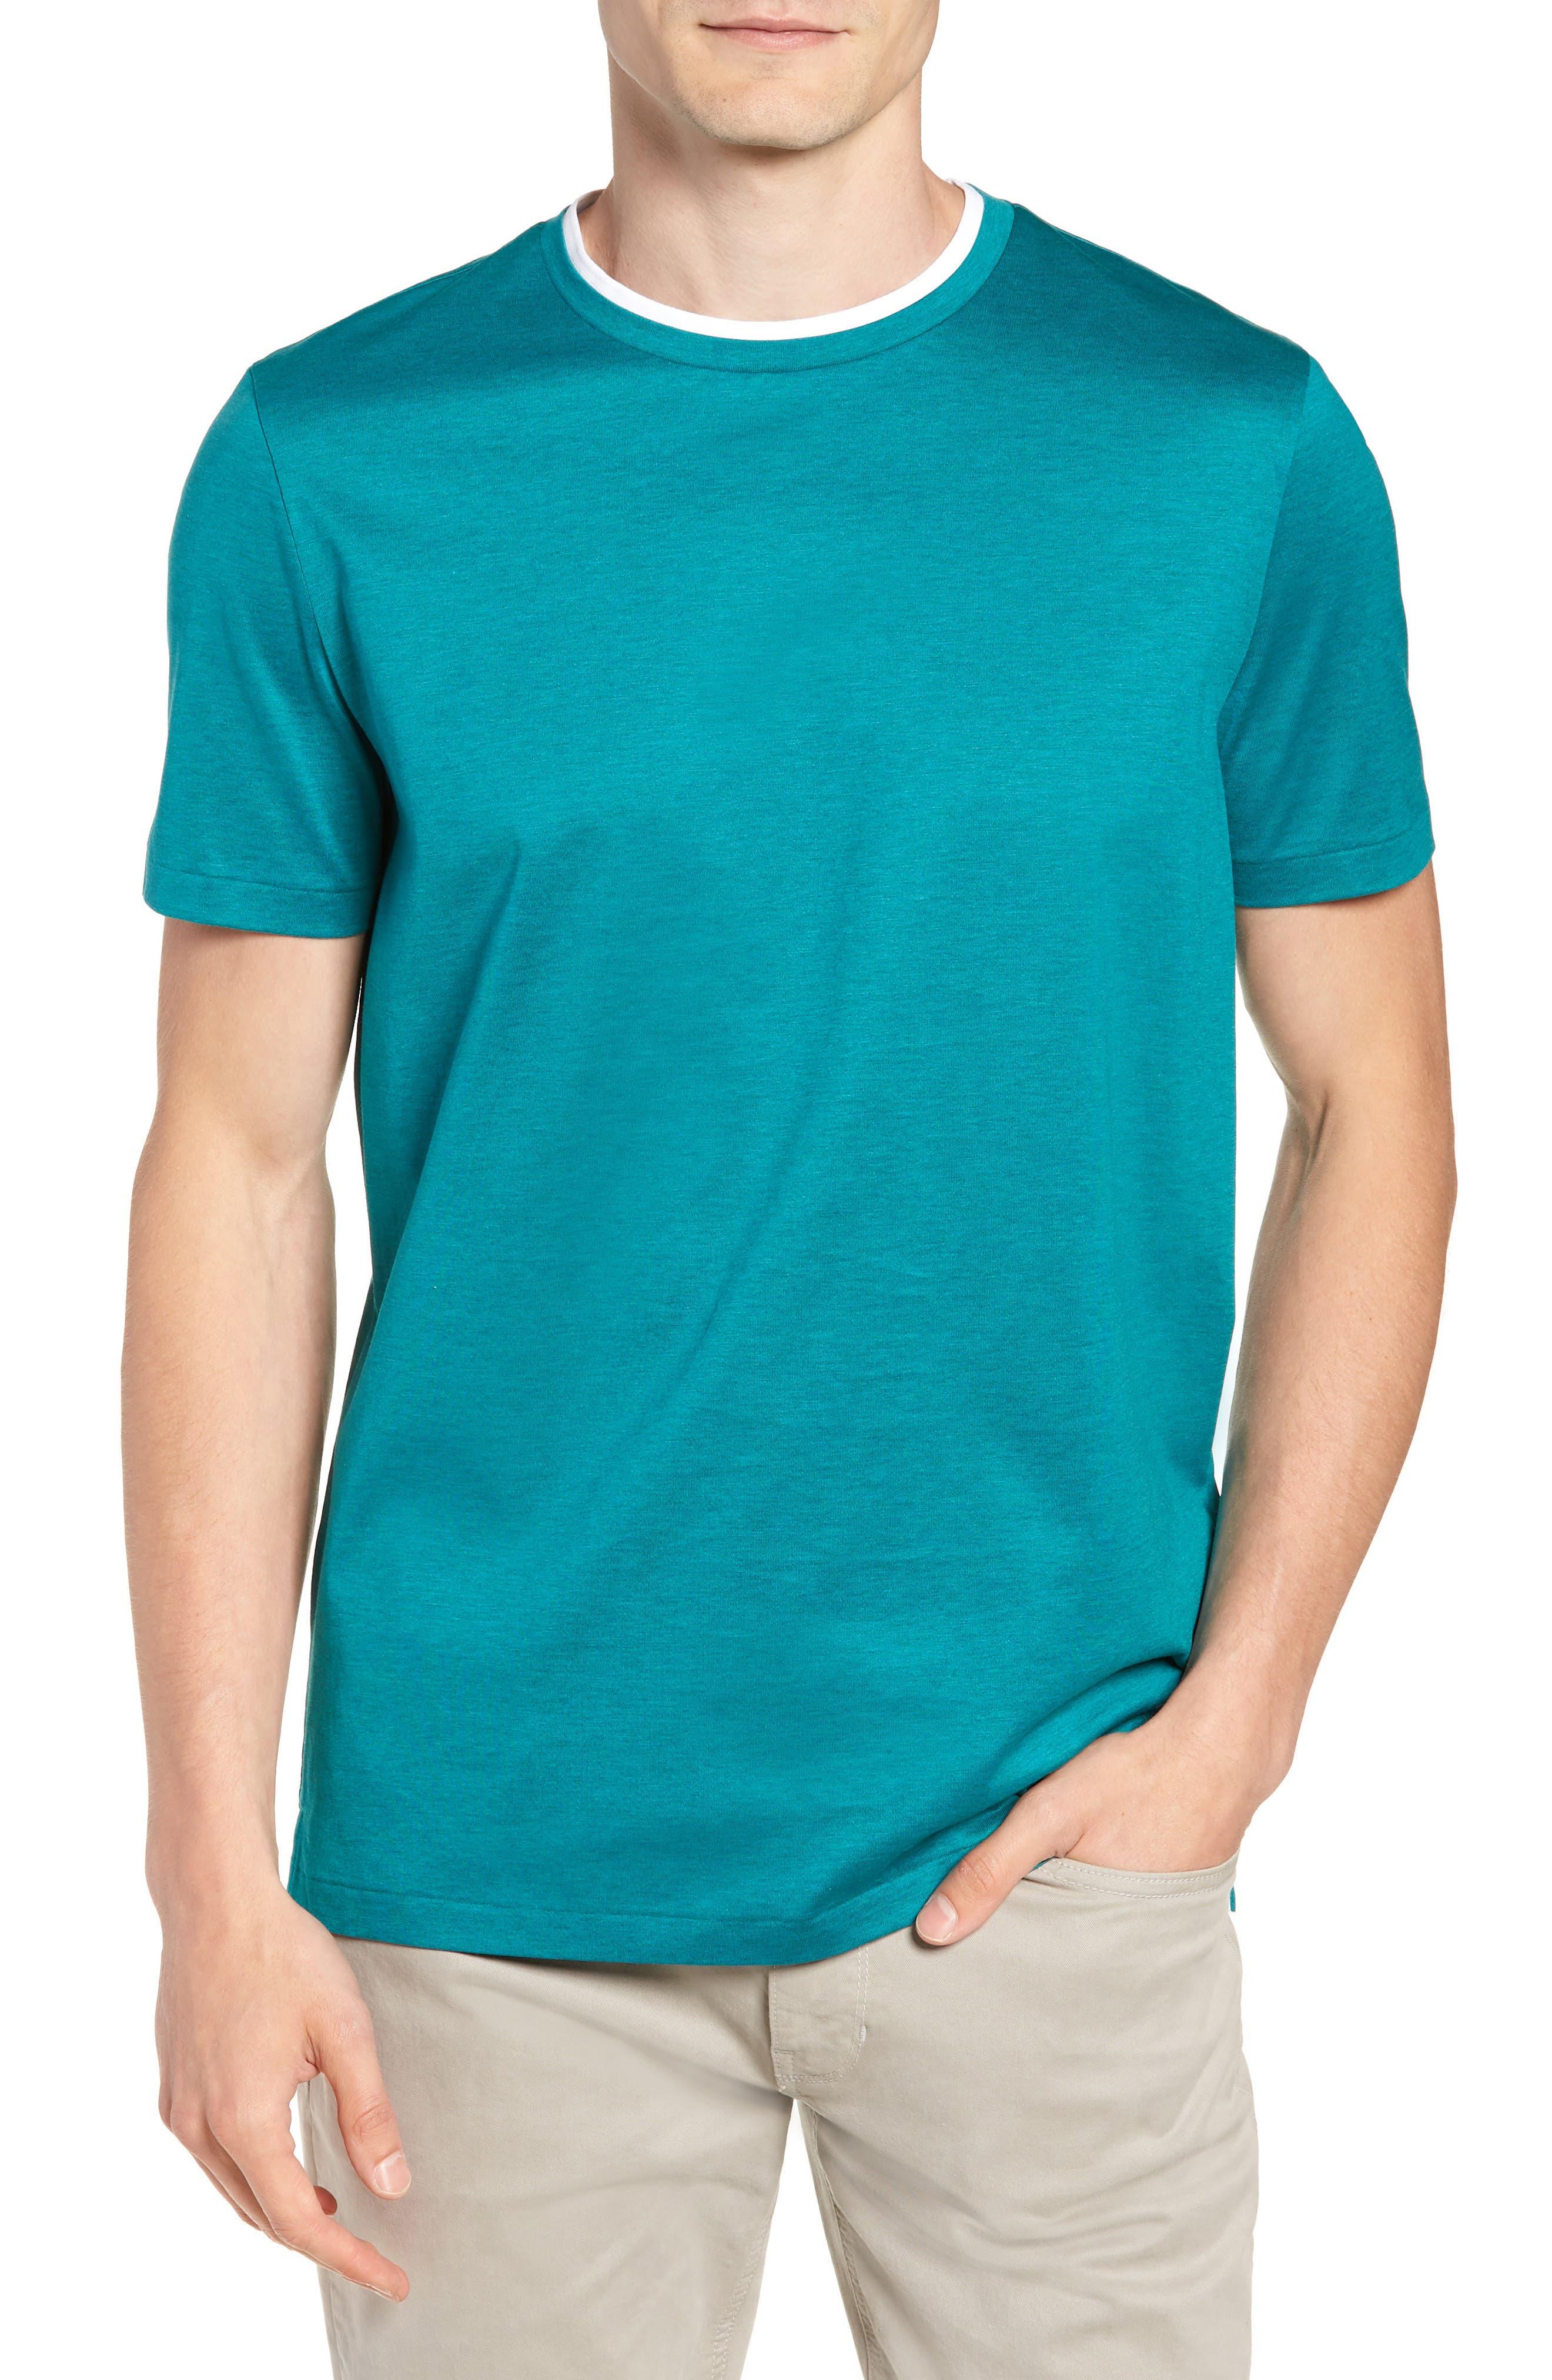 Taber Regular Fit T-Shirt,                         Main,                         color, GREEN